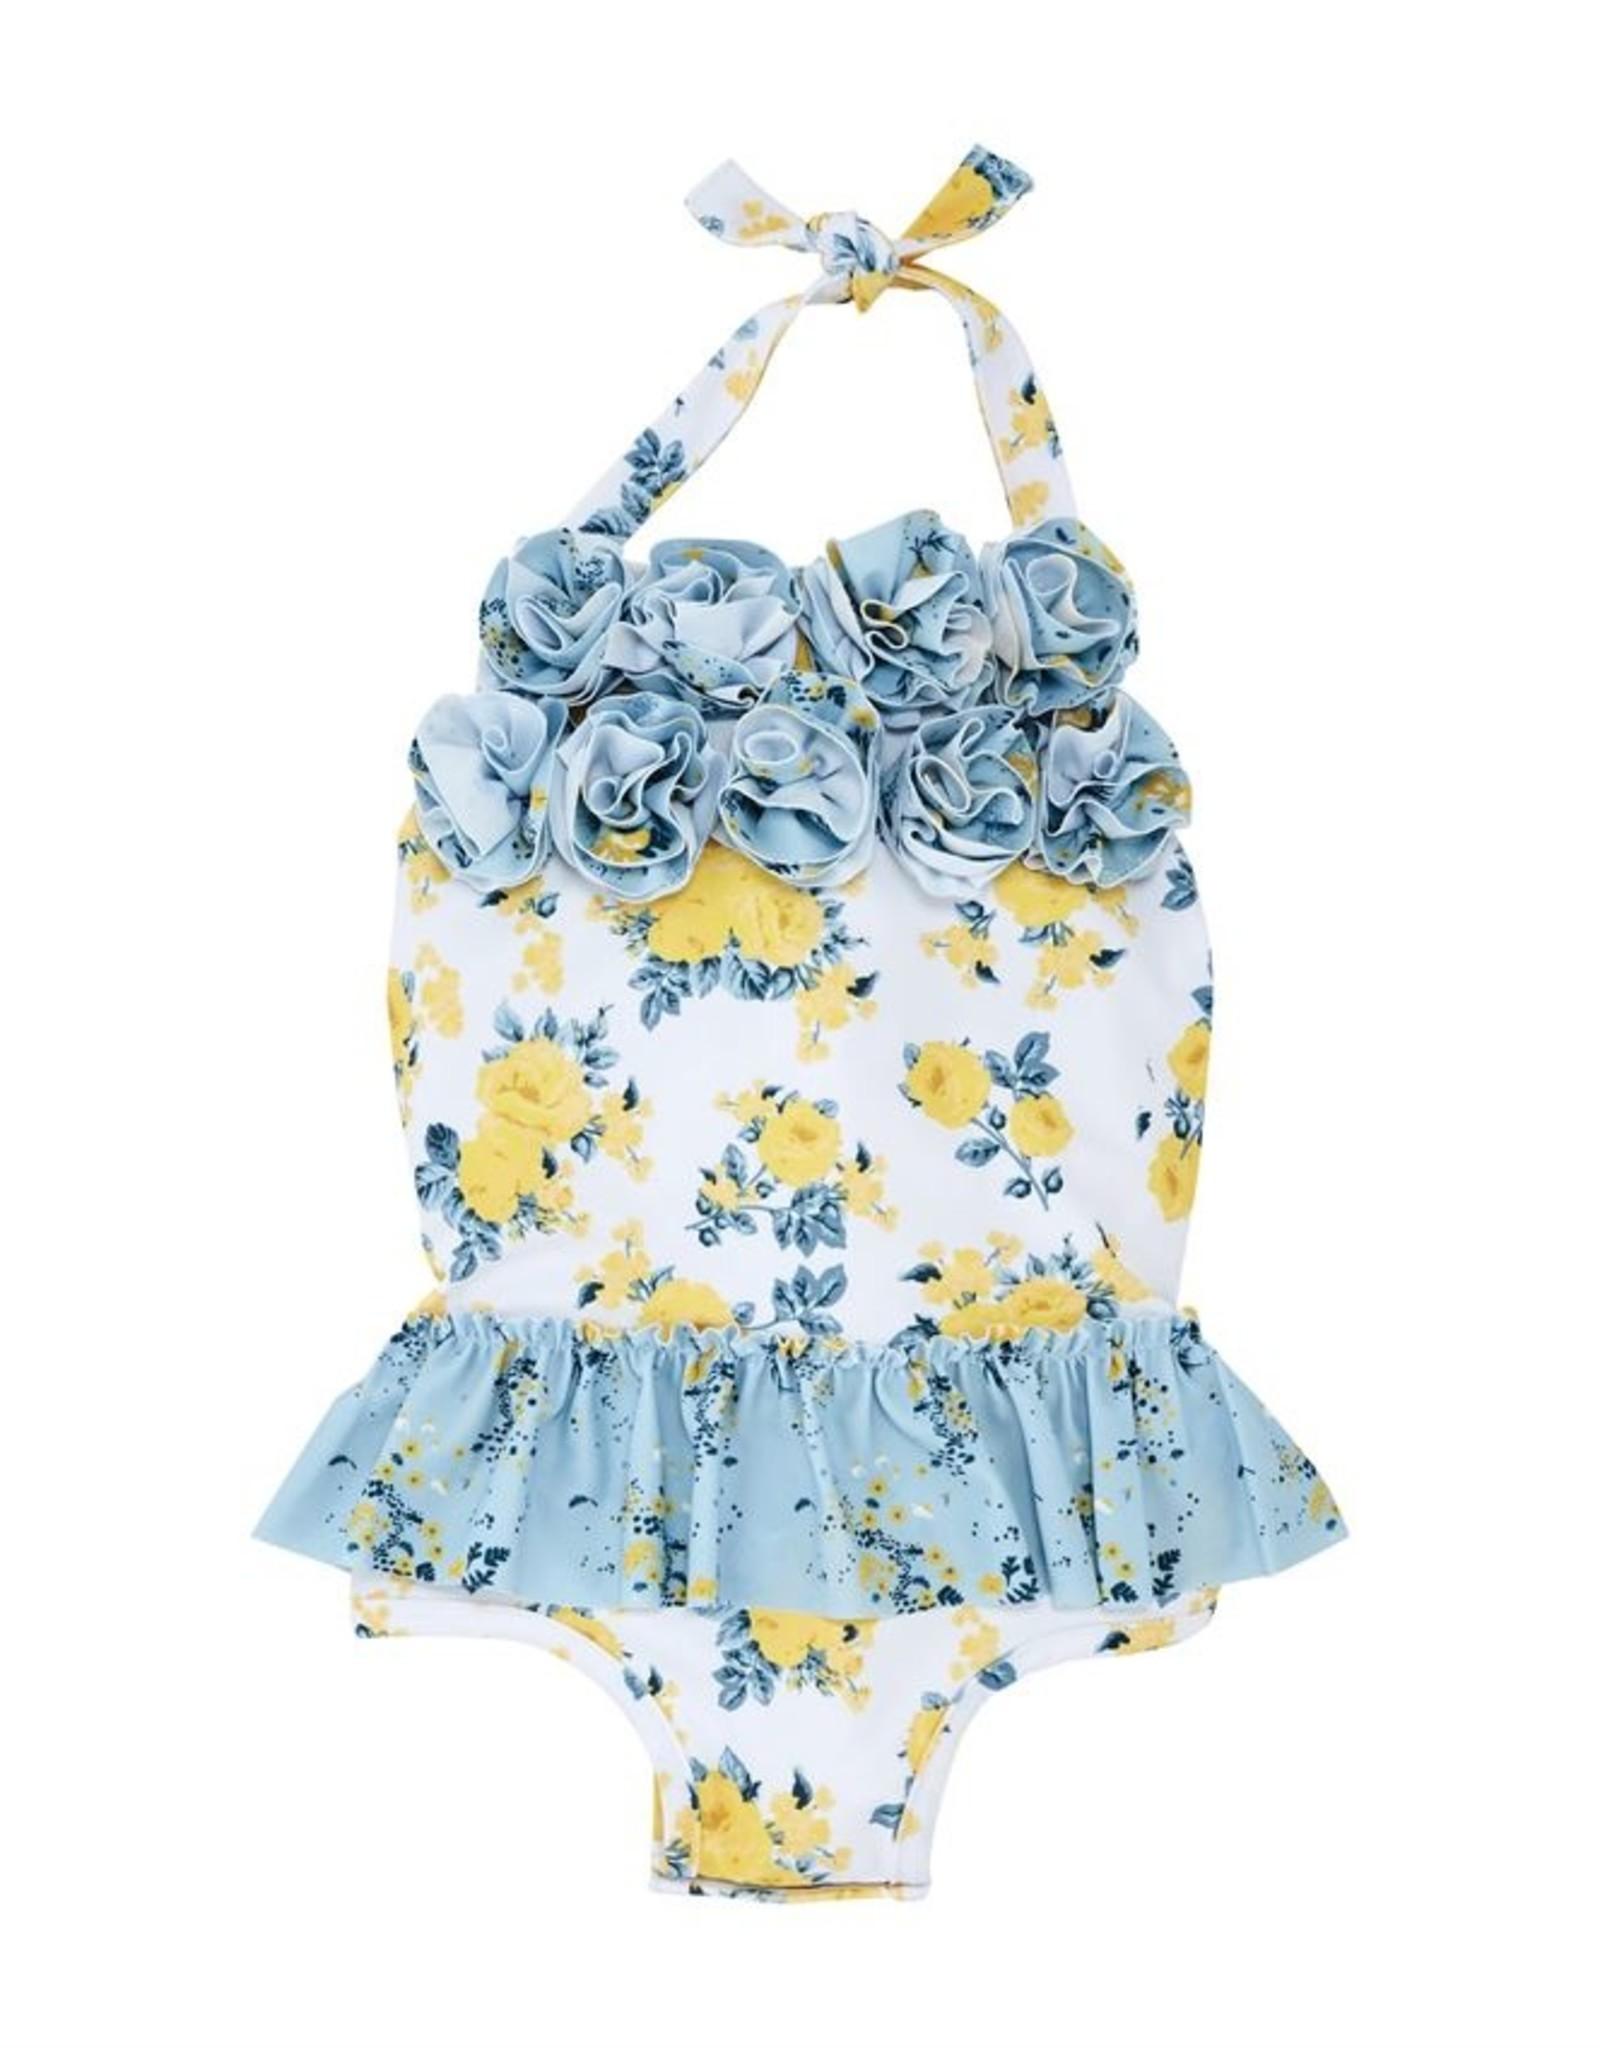 Mud Pie Floral 1 pc Swimsuit